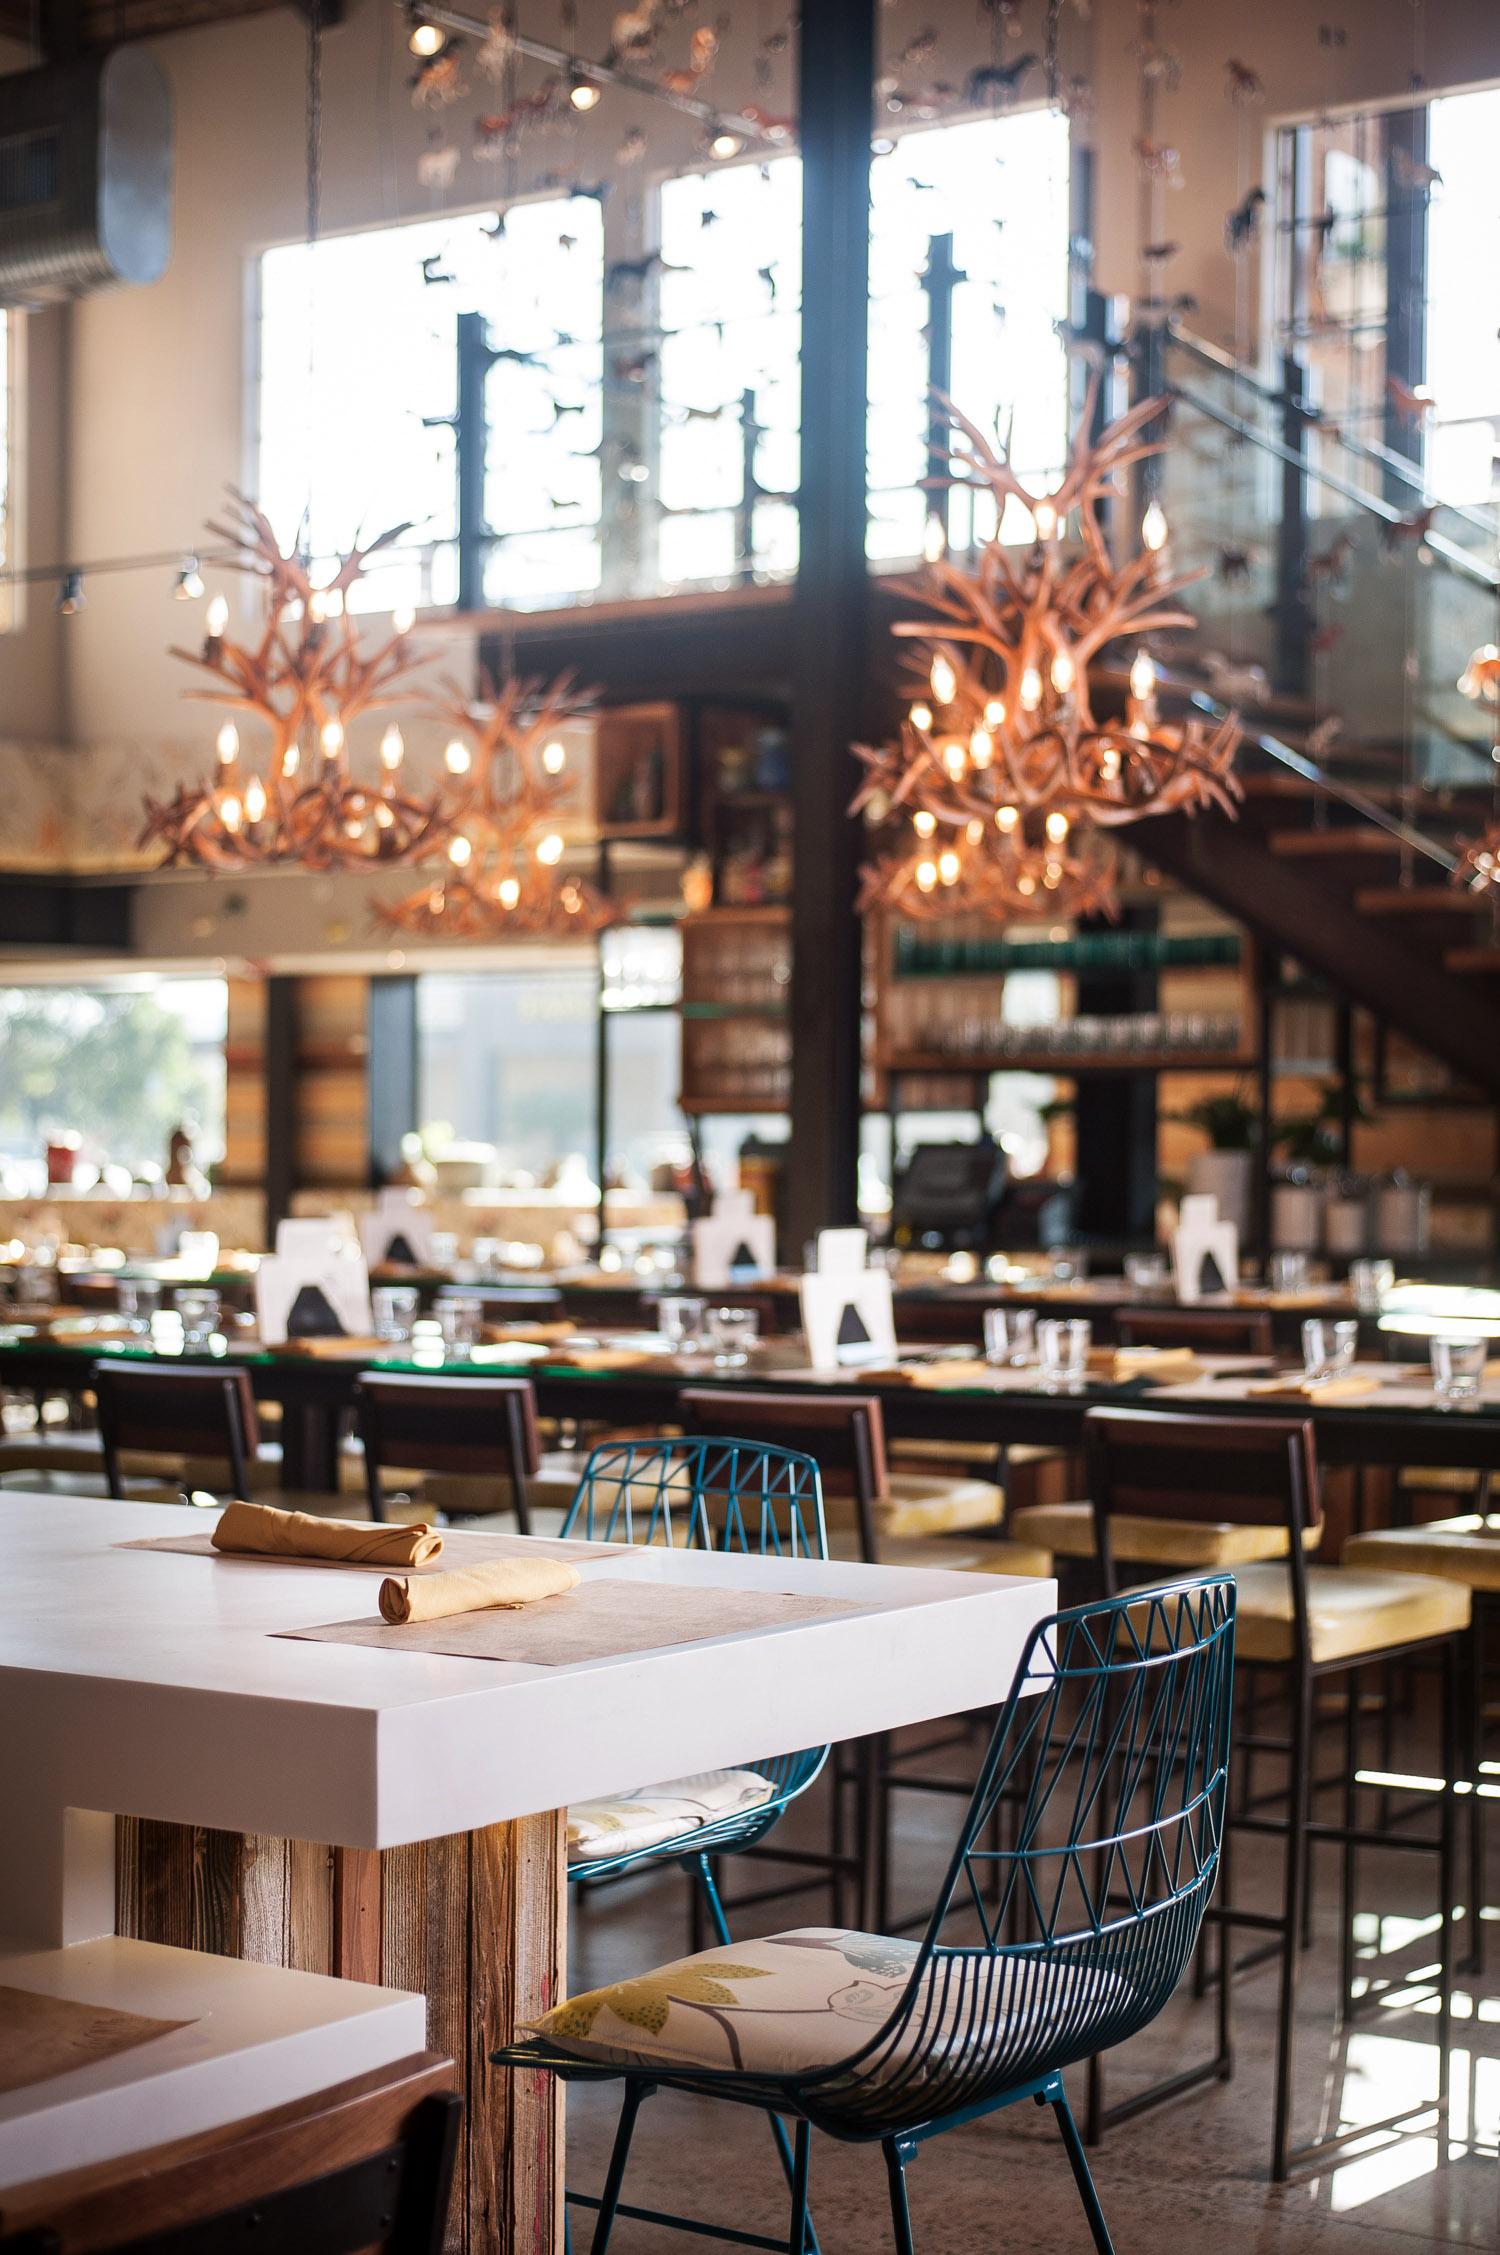 cucina enoteca - Restaurant Gallery